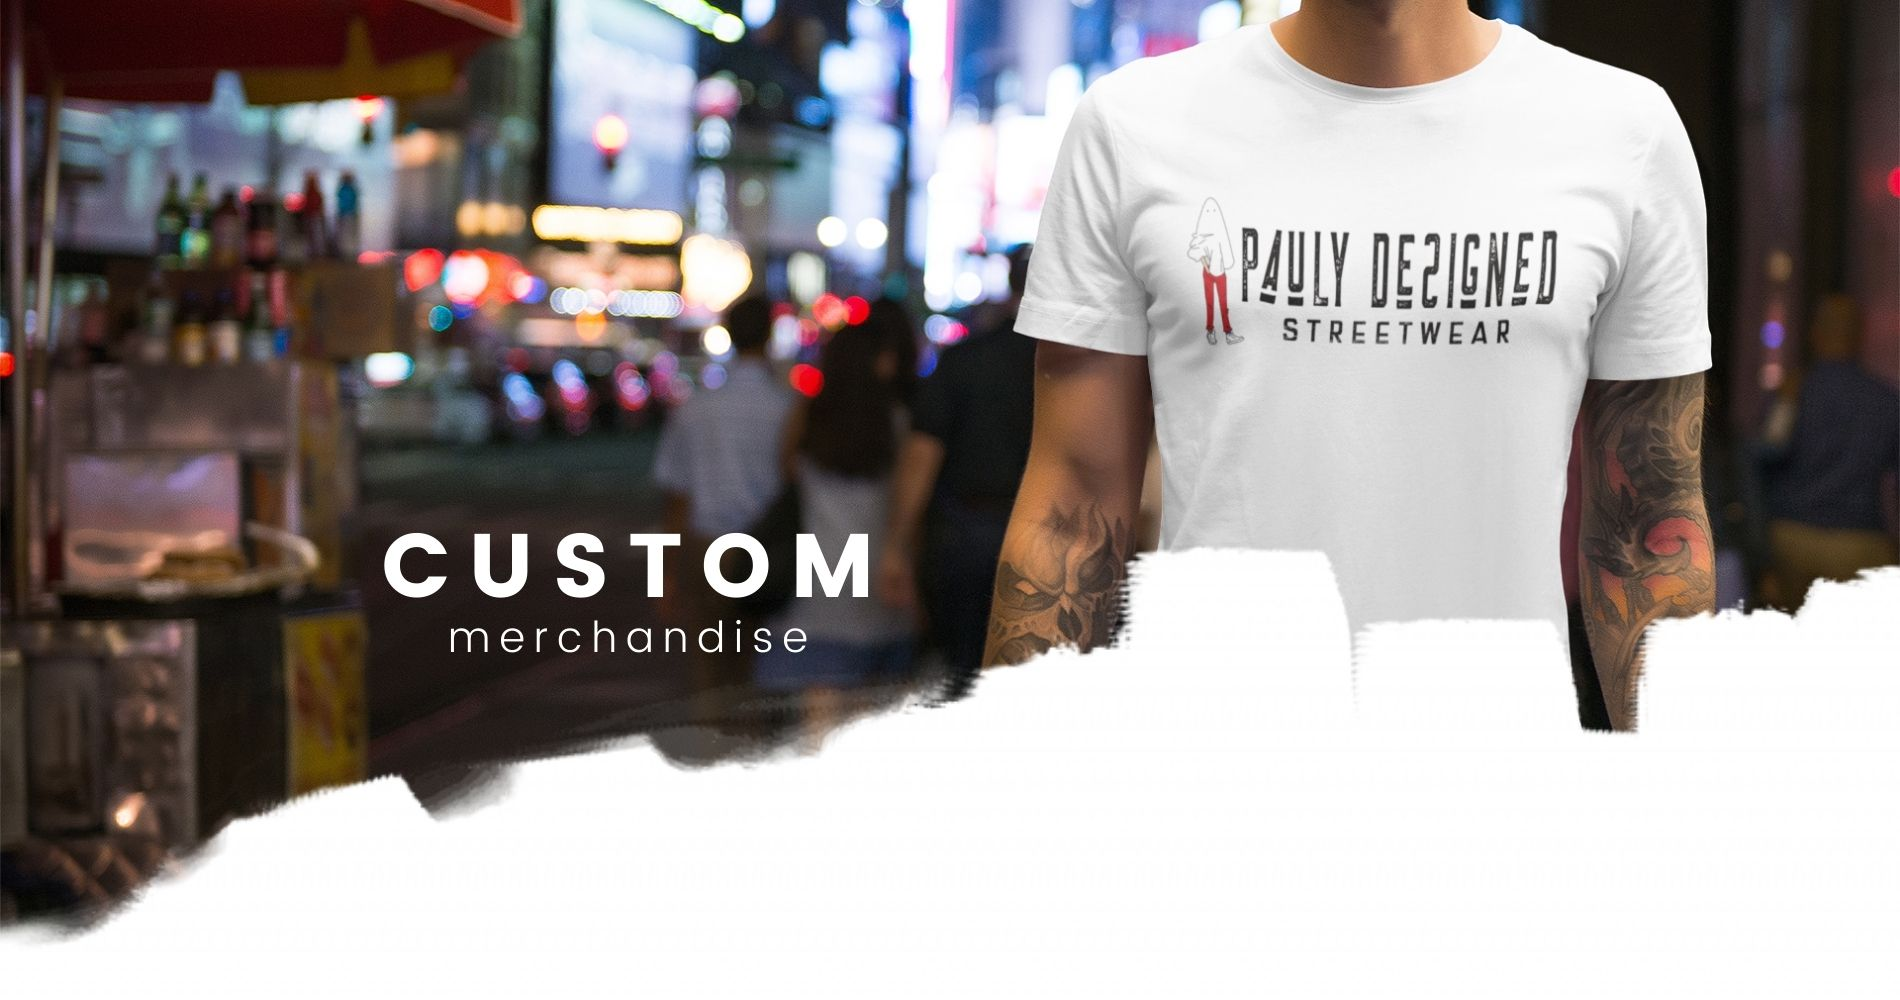 Pauly Designed Custom Merchandise